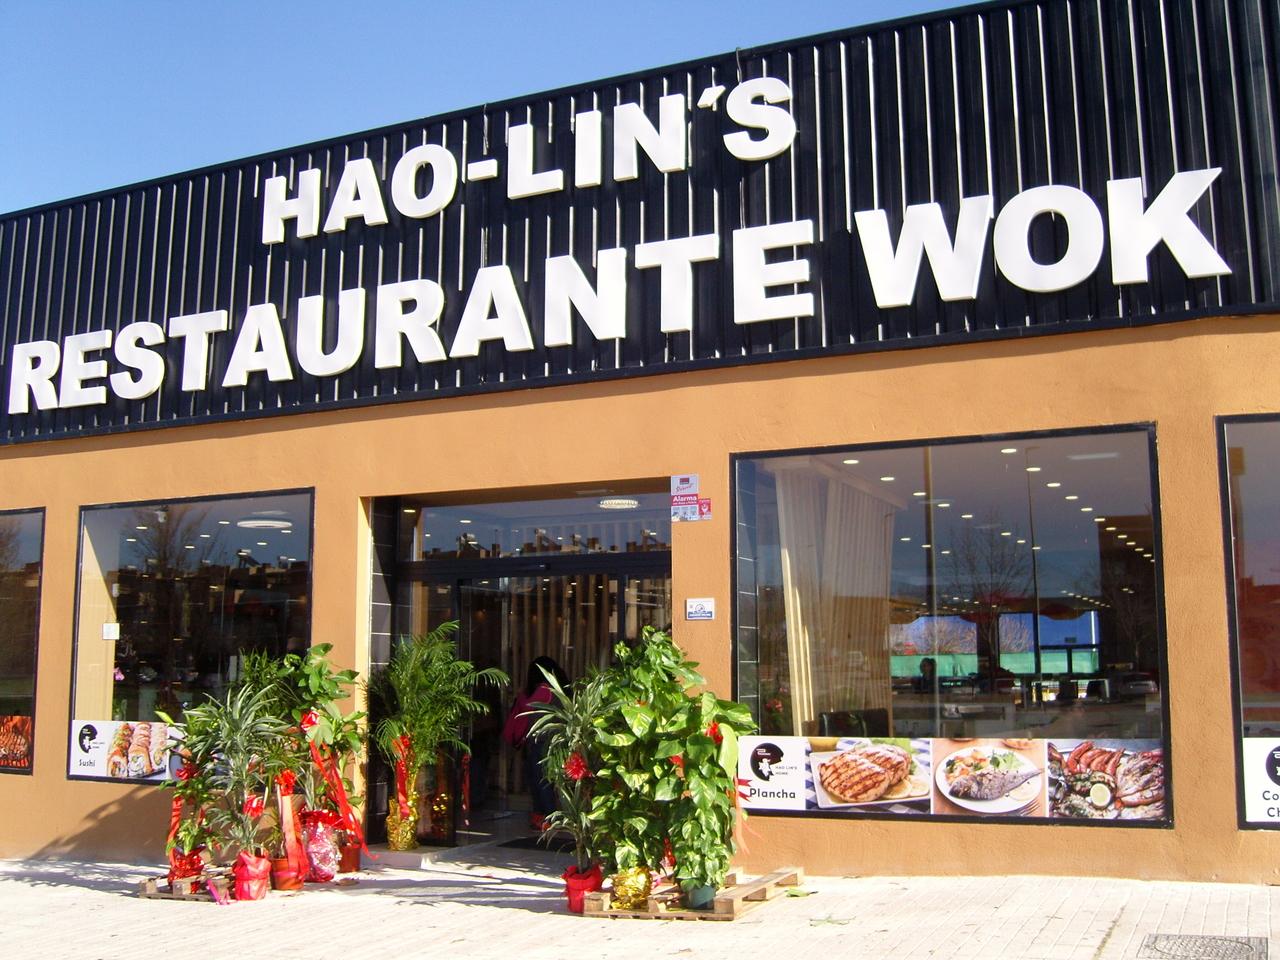 WOK HAO LIN'S HOME: